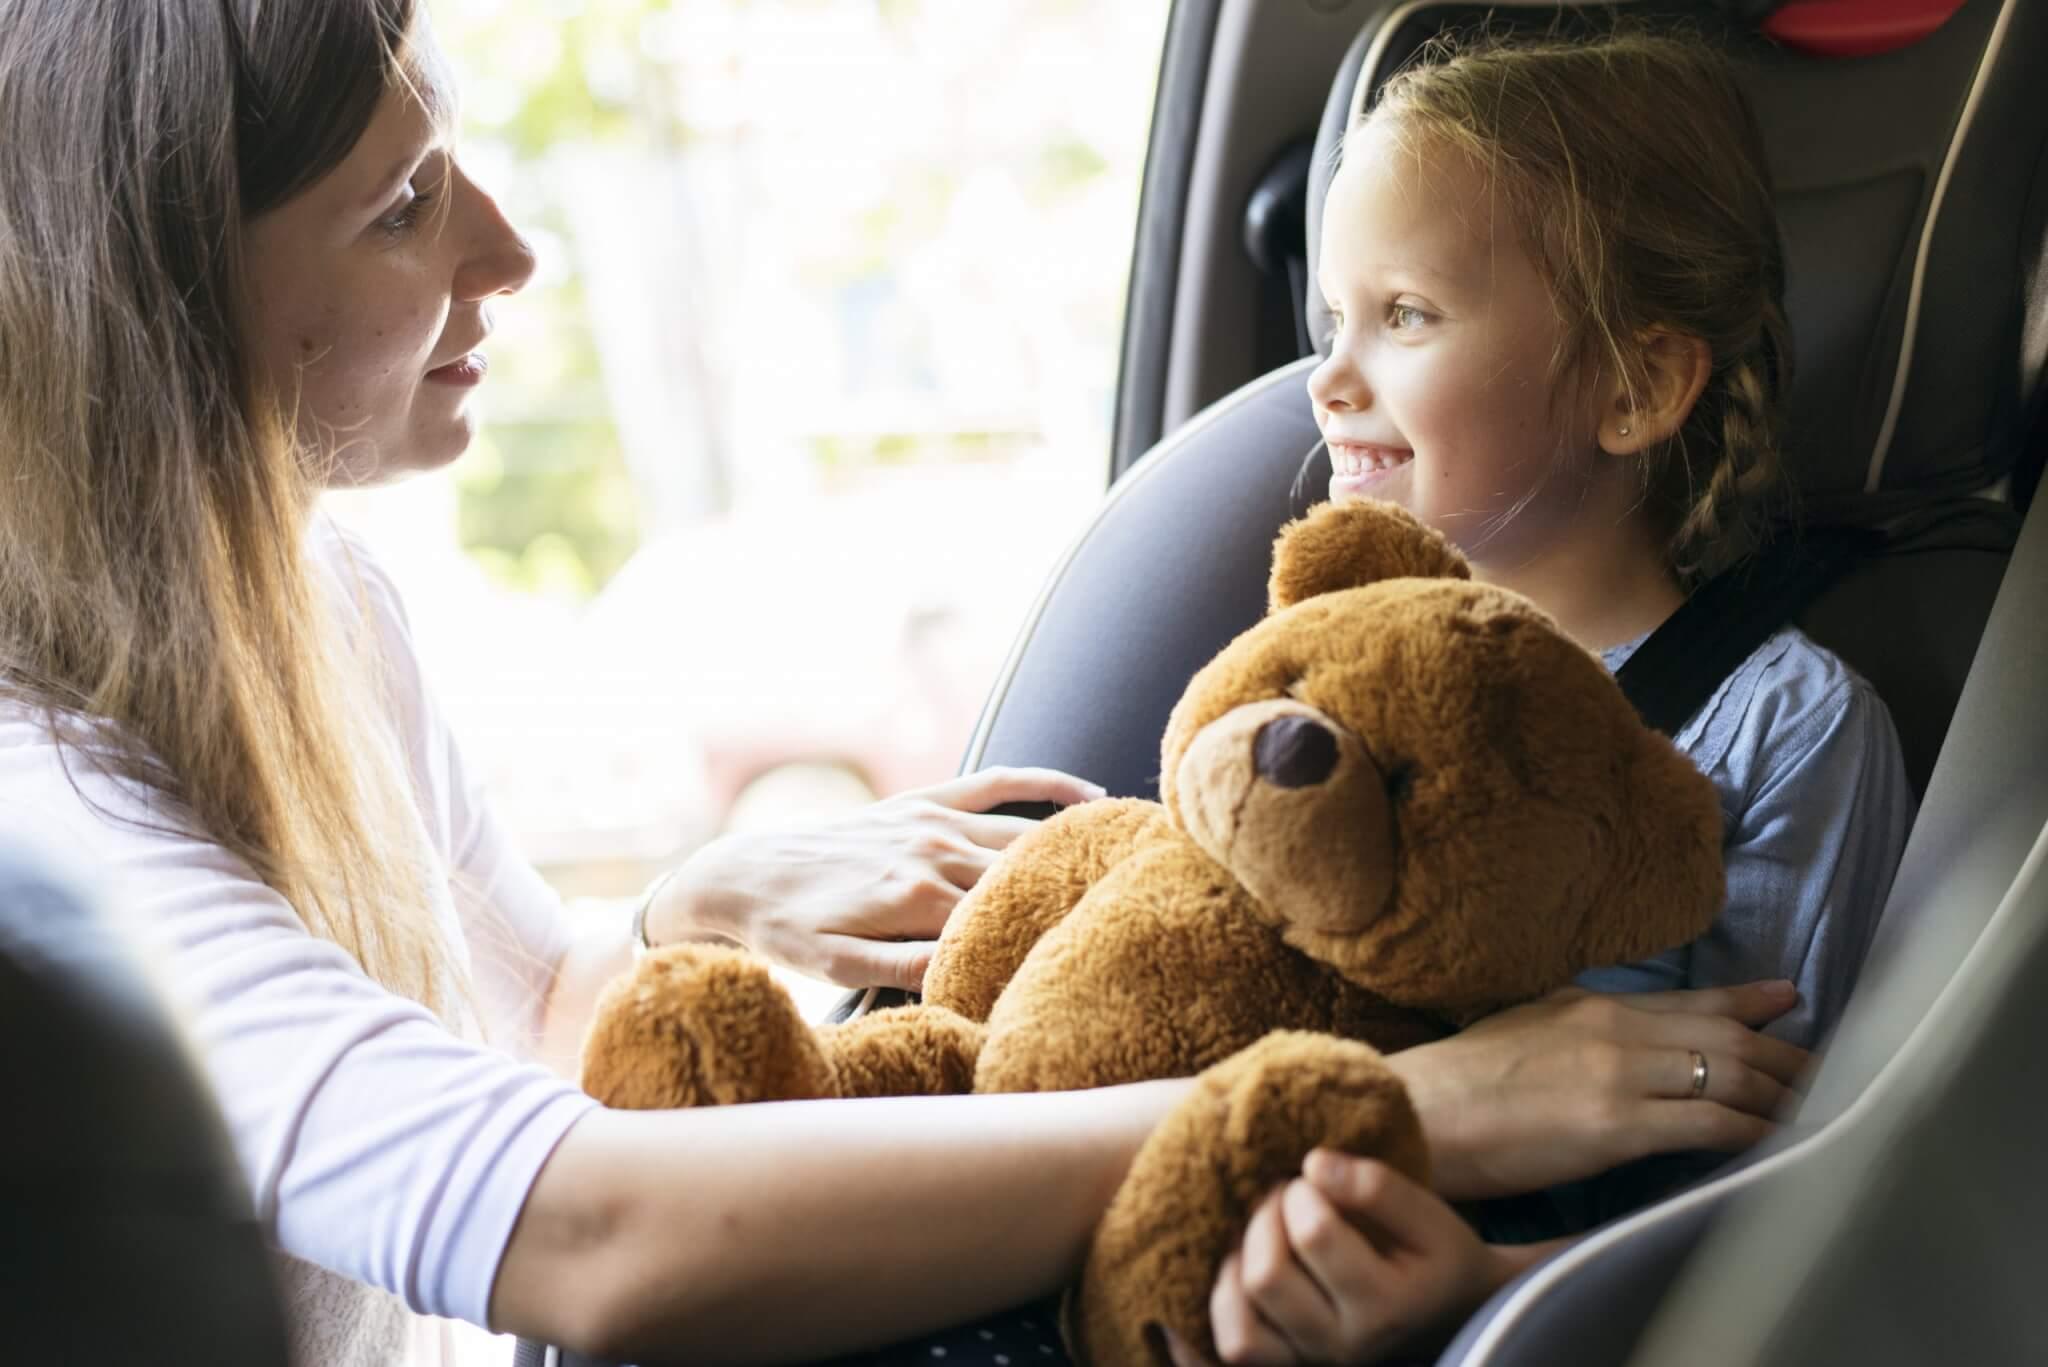 Barnens säkerhet bälteskudde bilbarnstol - Mother helping to put on the seat belt